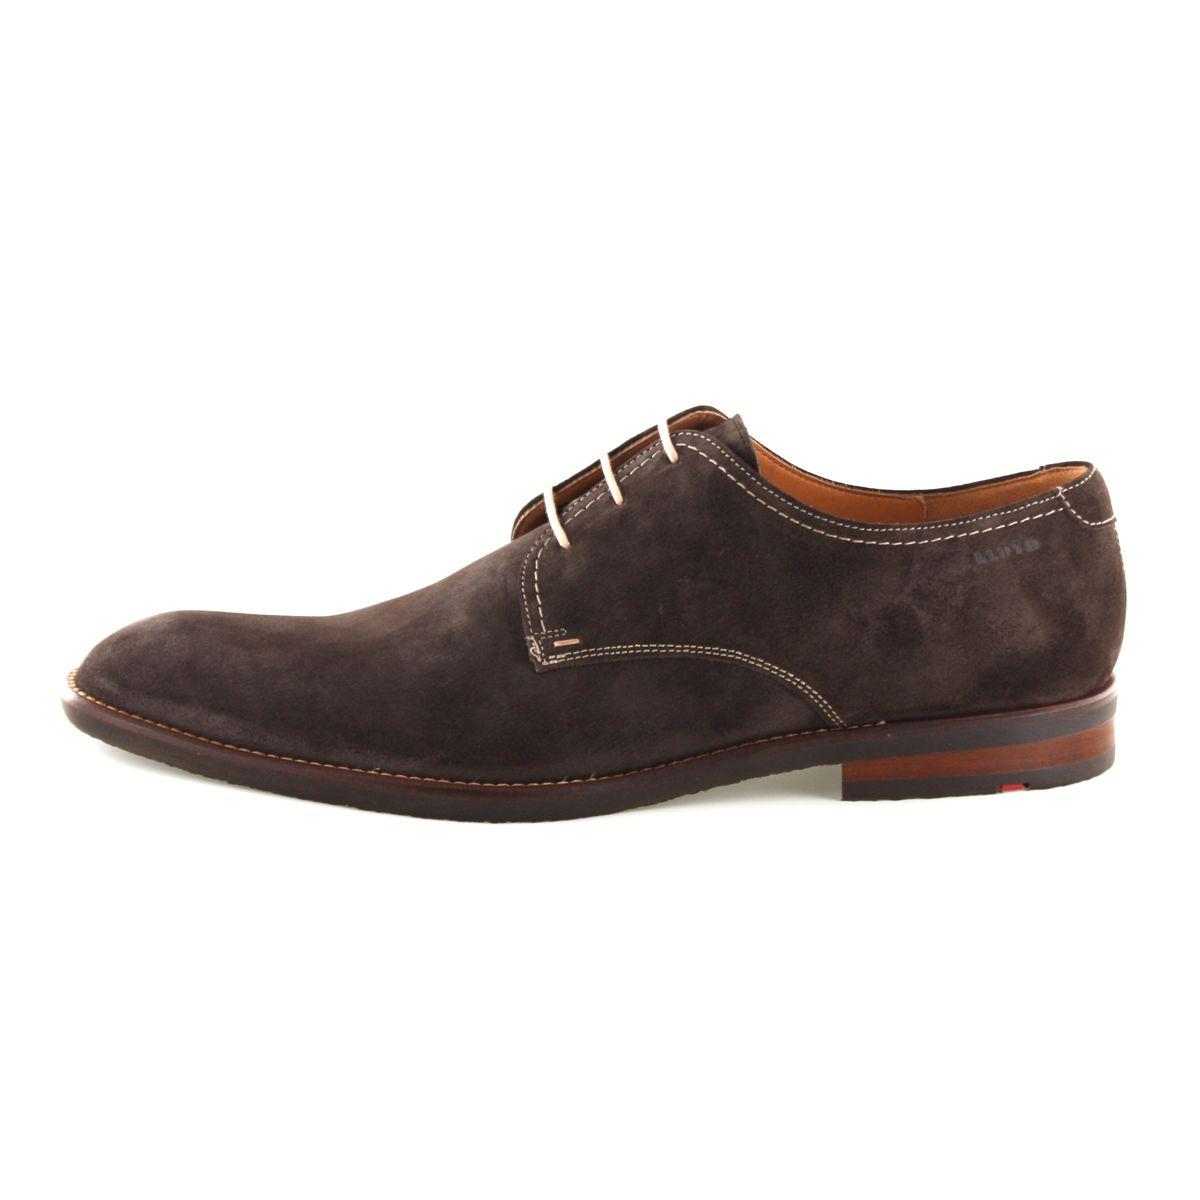 chaussures hel marron en cuir su d grande taille du 46 au 51 size factory lloyd. Black Bedroom Furniture Sets. Home Design Ideas